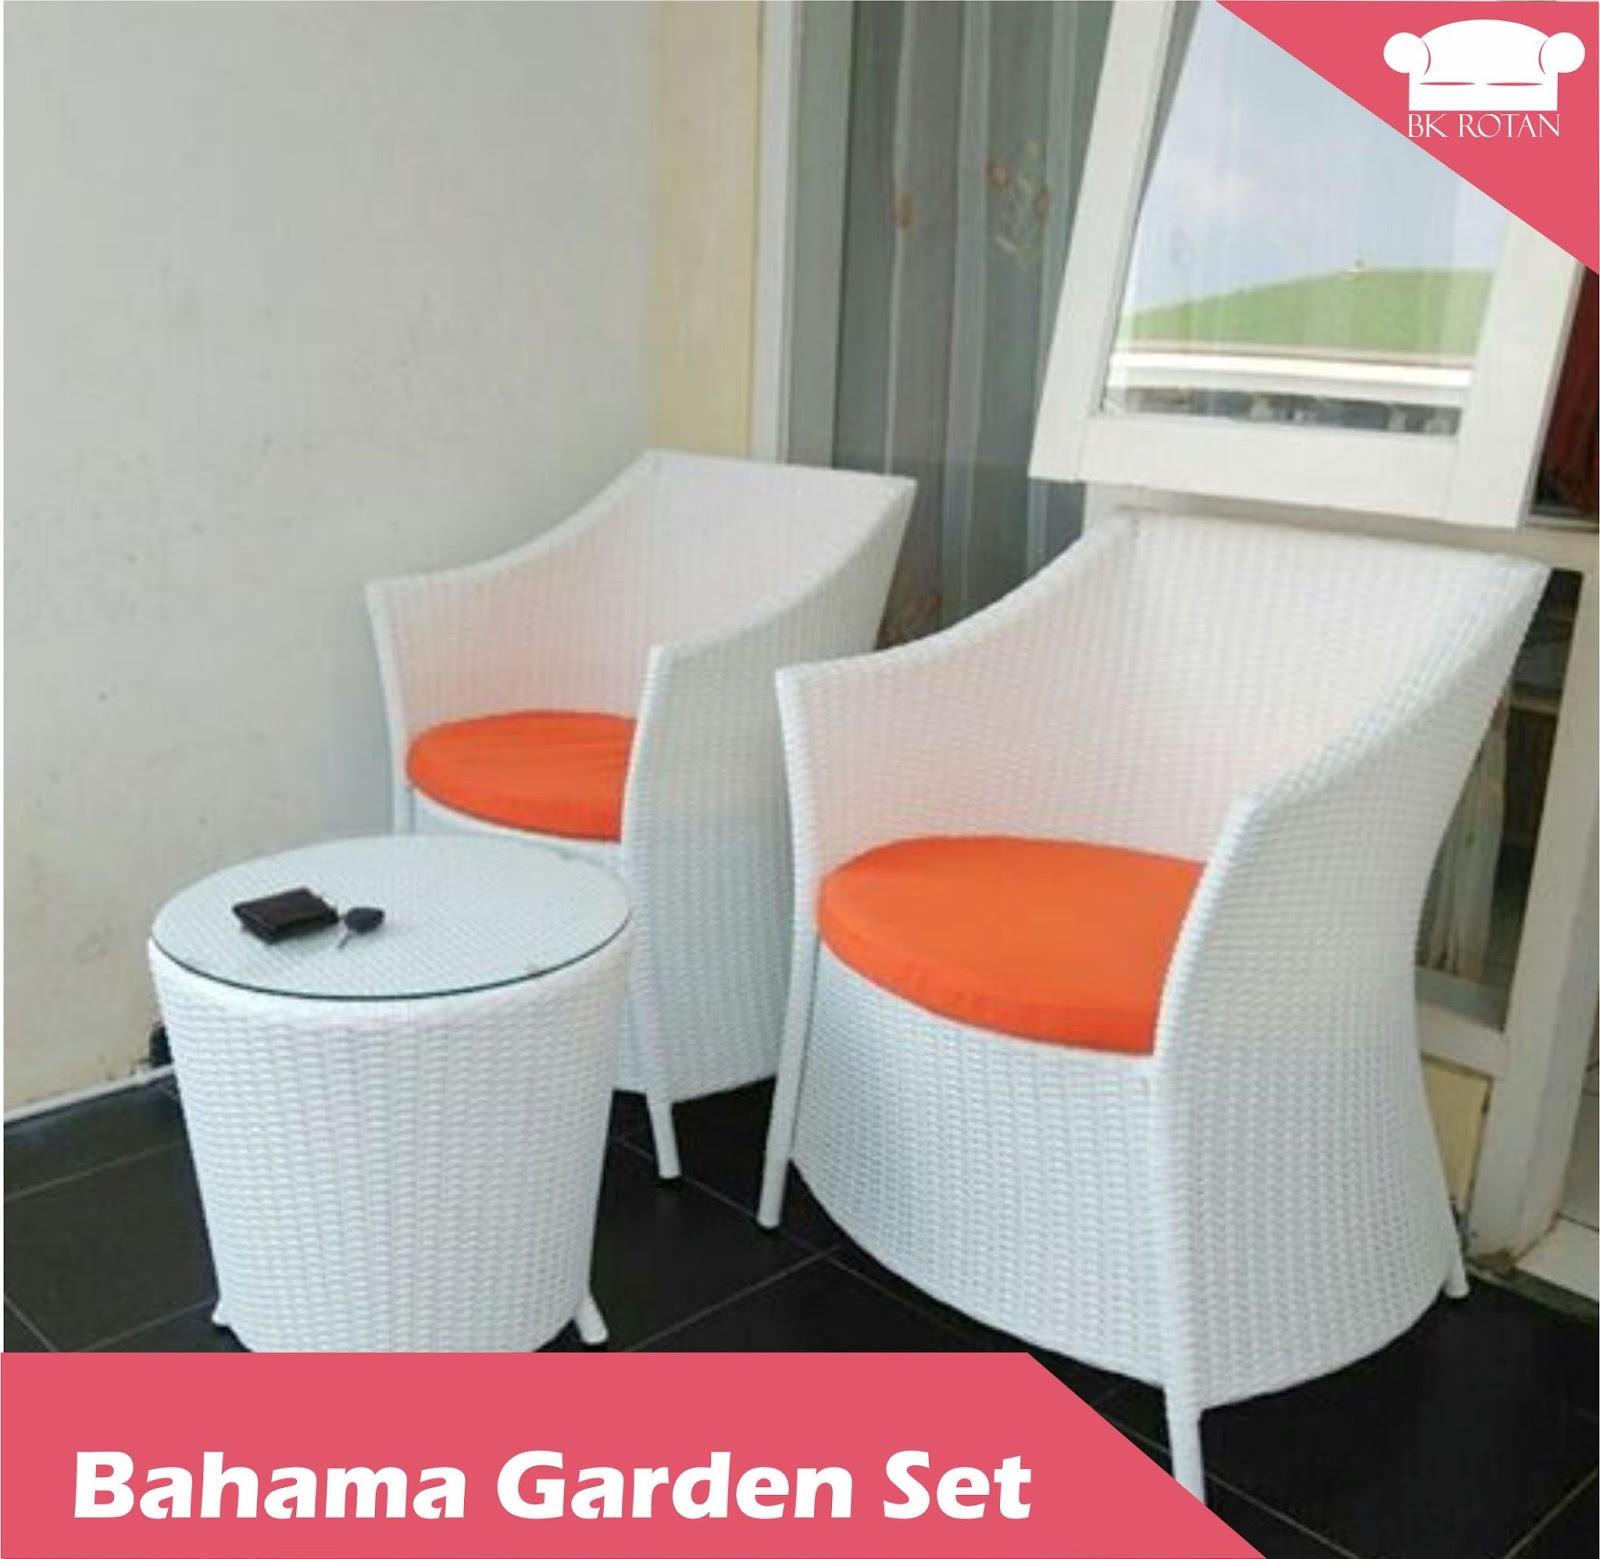 Bahama Garden Set Buana Kreasi Rotan 1 Kursi Teras Minimalis Sintetis